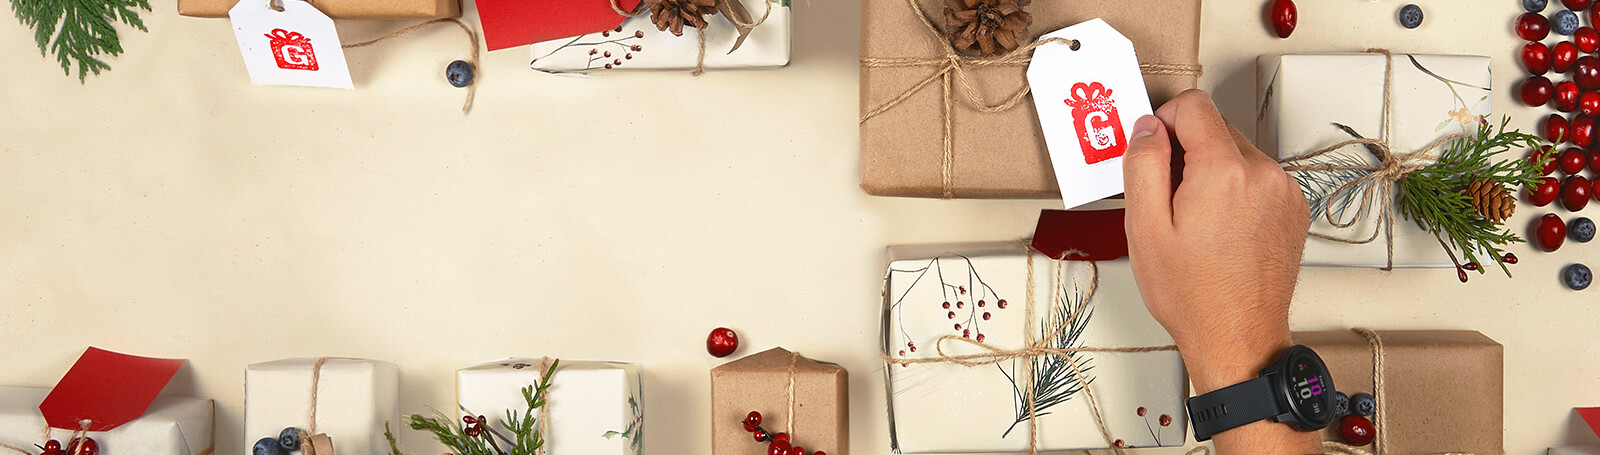 catalog/Christmas/2020/35145-1-D.jpg